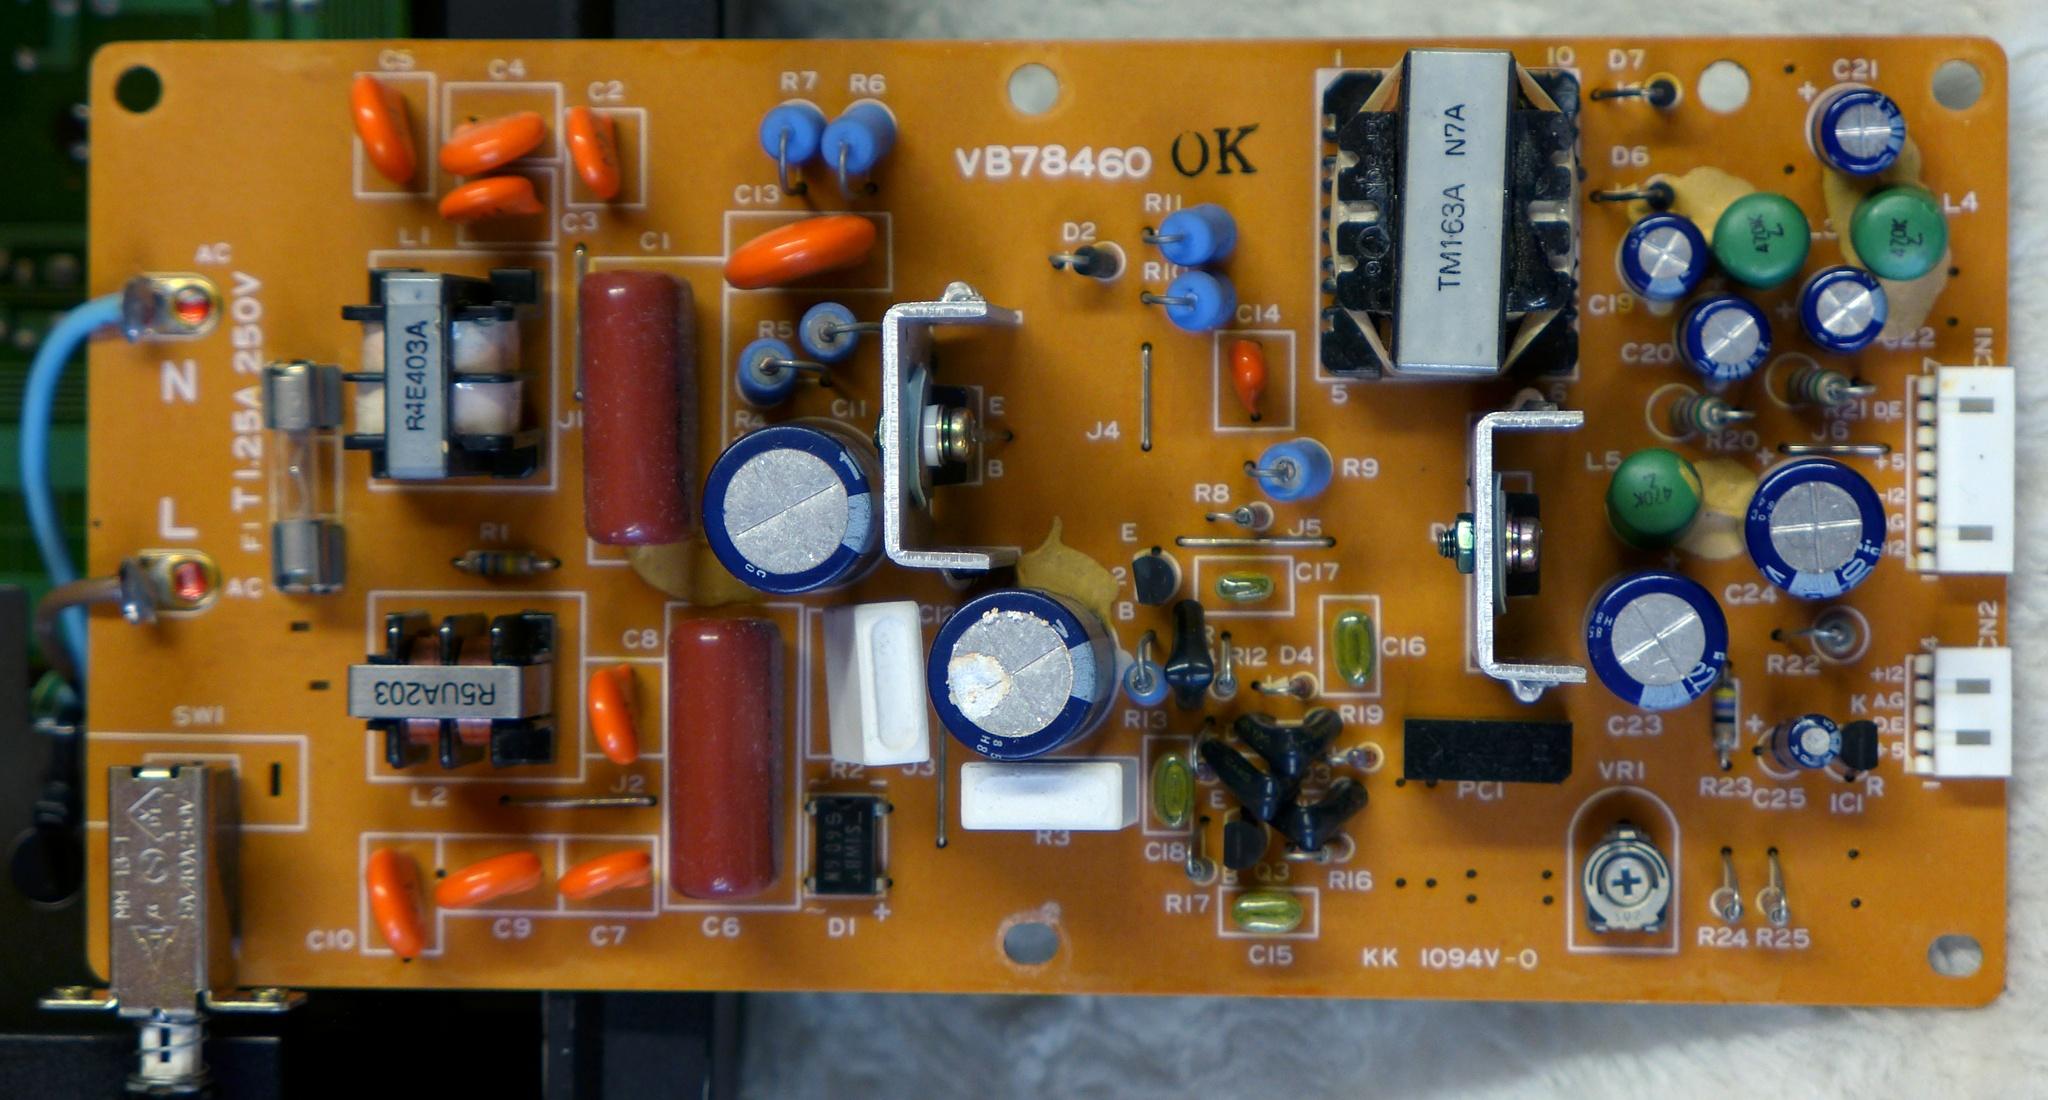 File:Yamaha DX7II-D - PSU (2017-02-22 16 19 35 by deepsonic) jpg